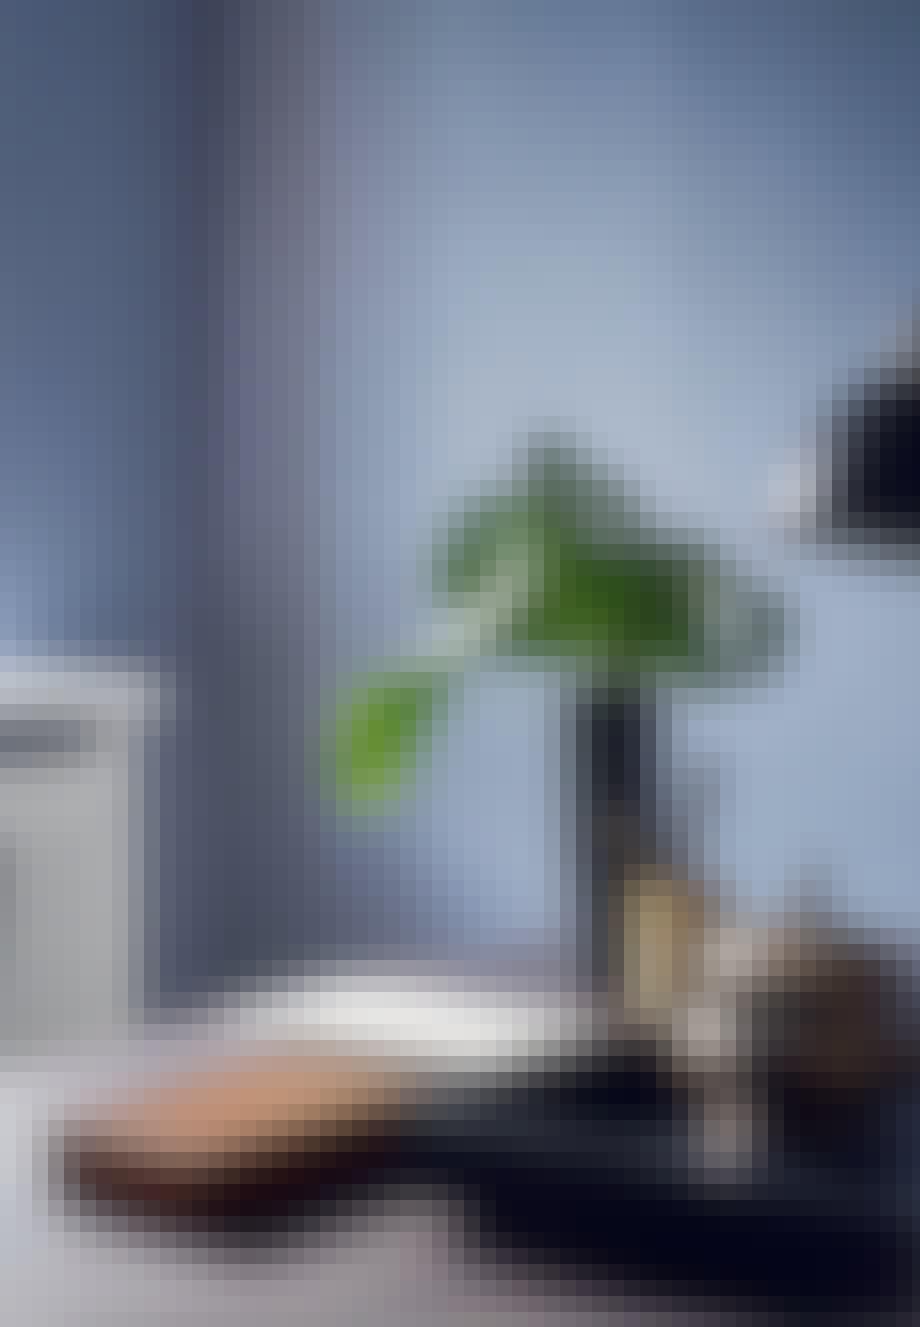 Sort marmorvase, læderbakke, røgelseskar og bordlampe på skrivebordet